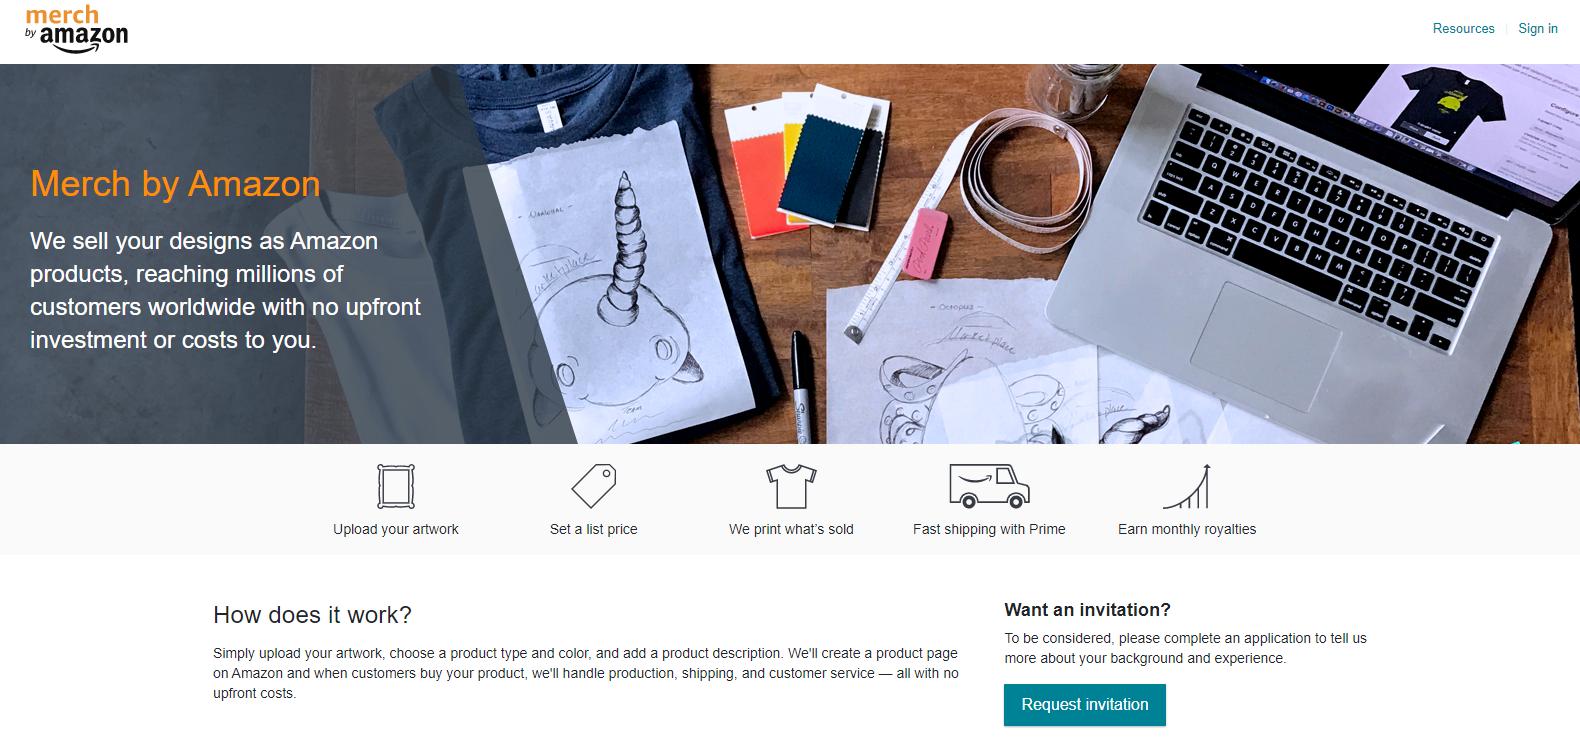 Amazon Merch Website